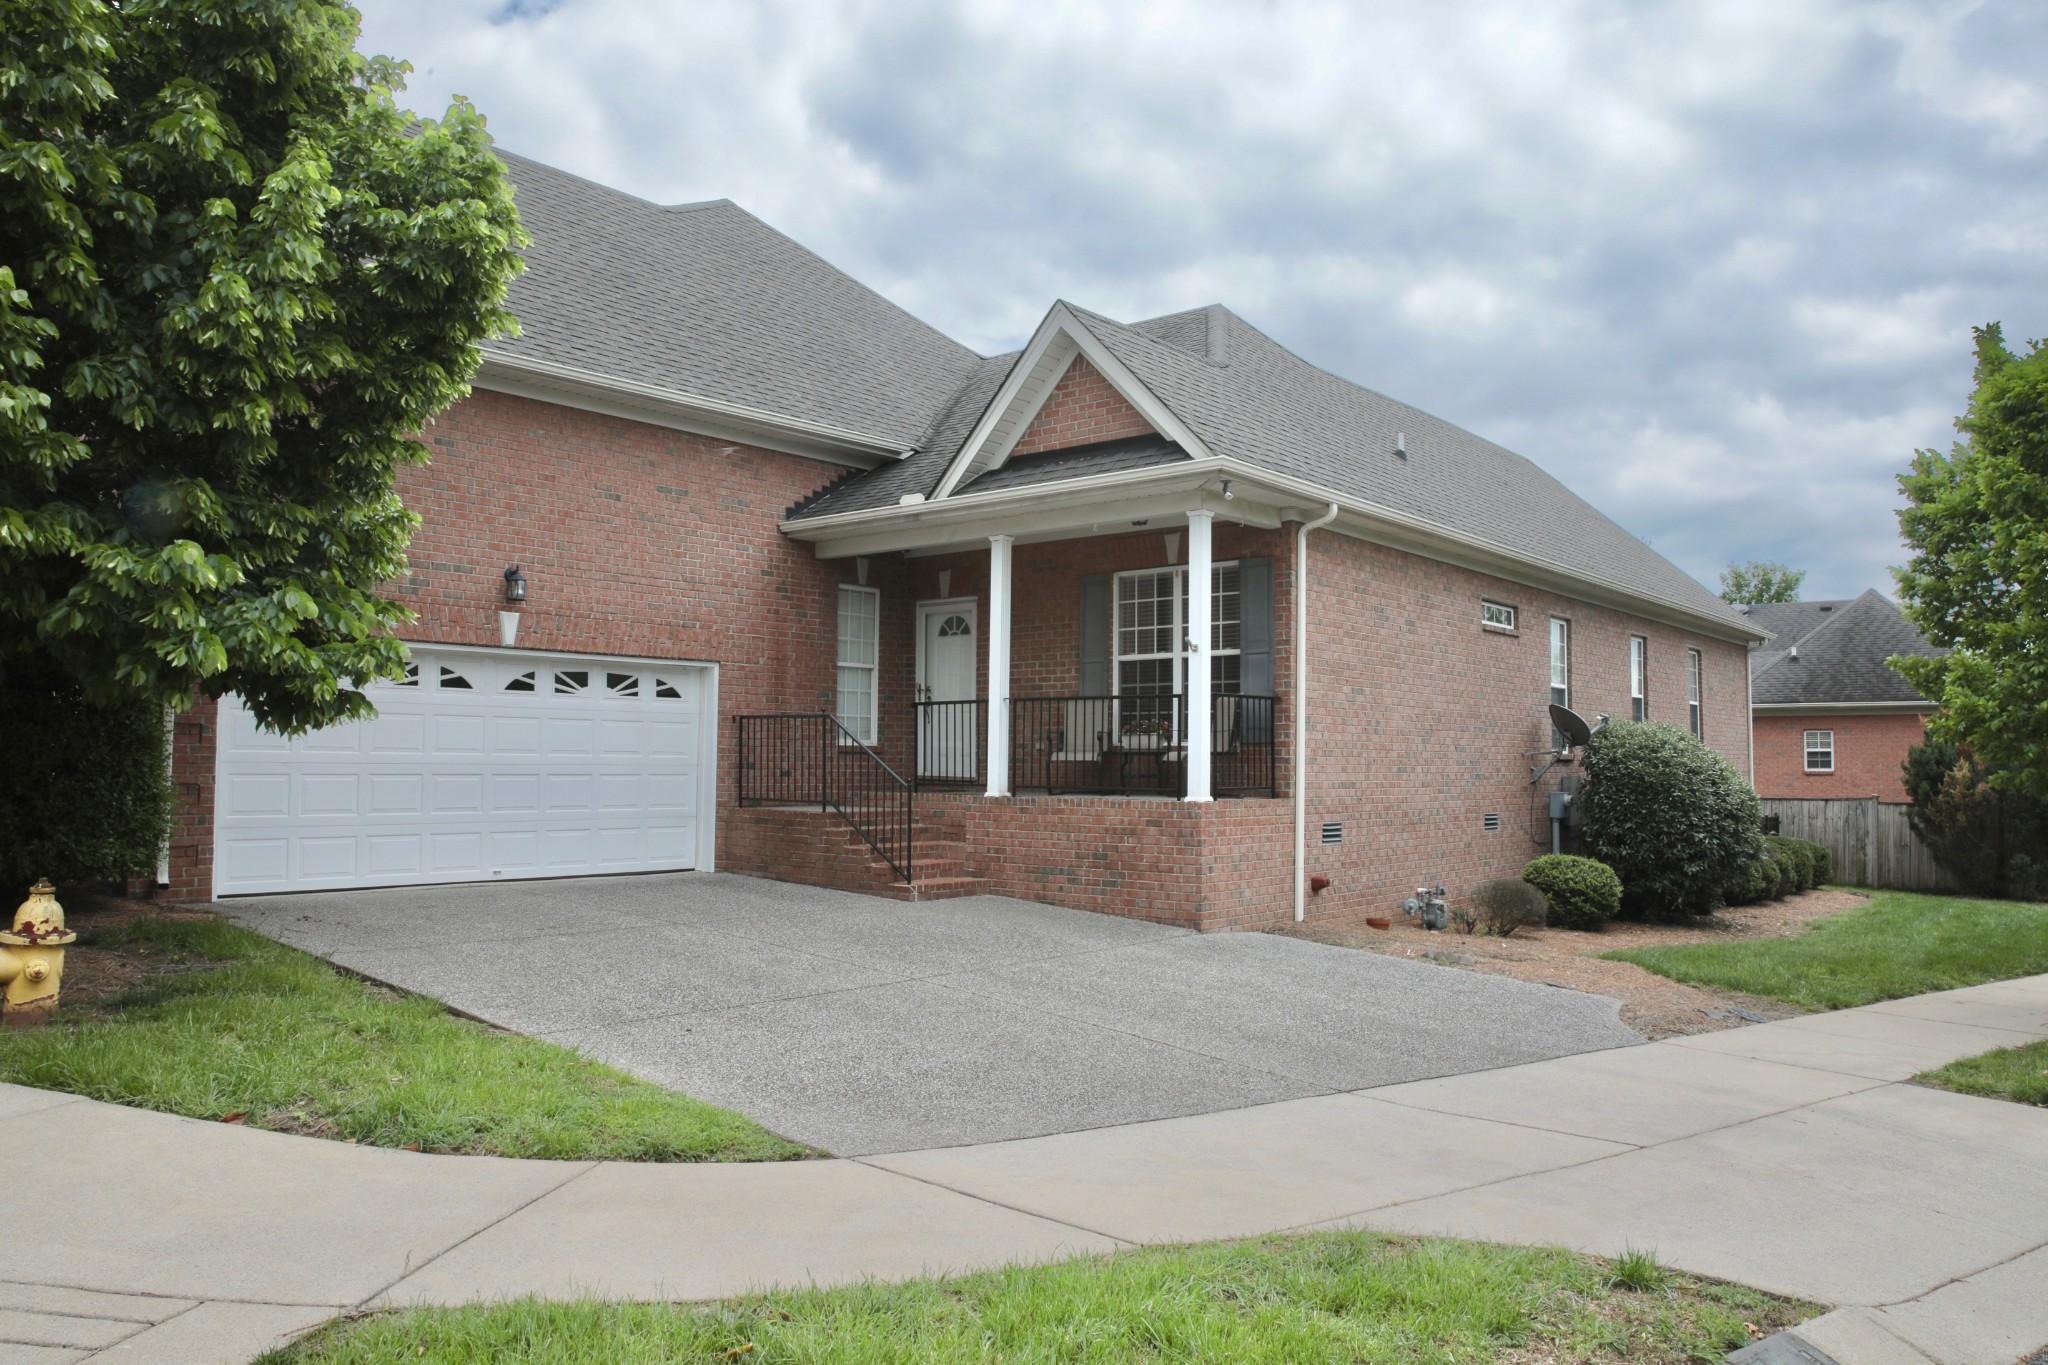 One Level Living, Massive Sunroom, Fenced In Back Yard!  108 Brittain St. ,,Hendersonville, TN.  37075